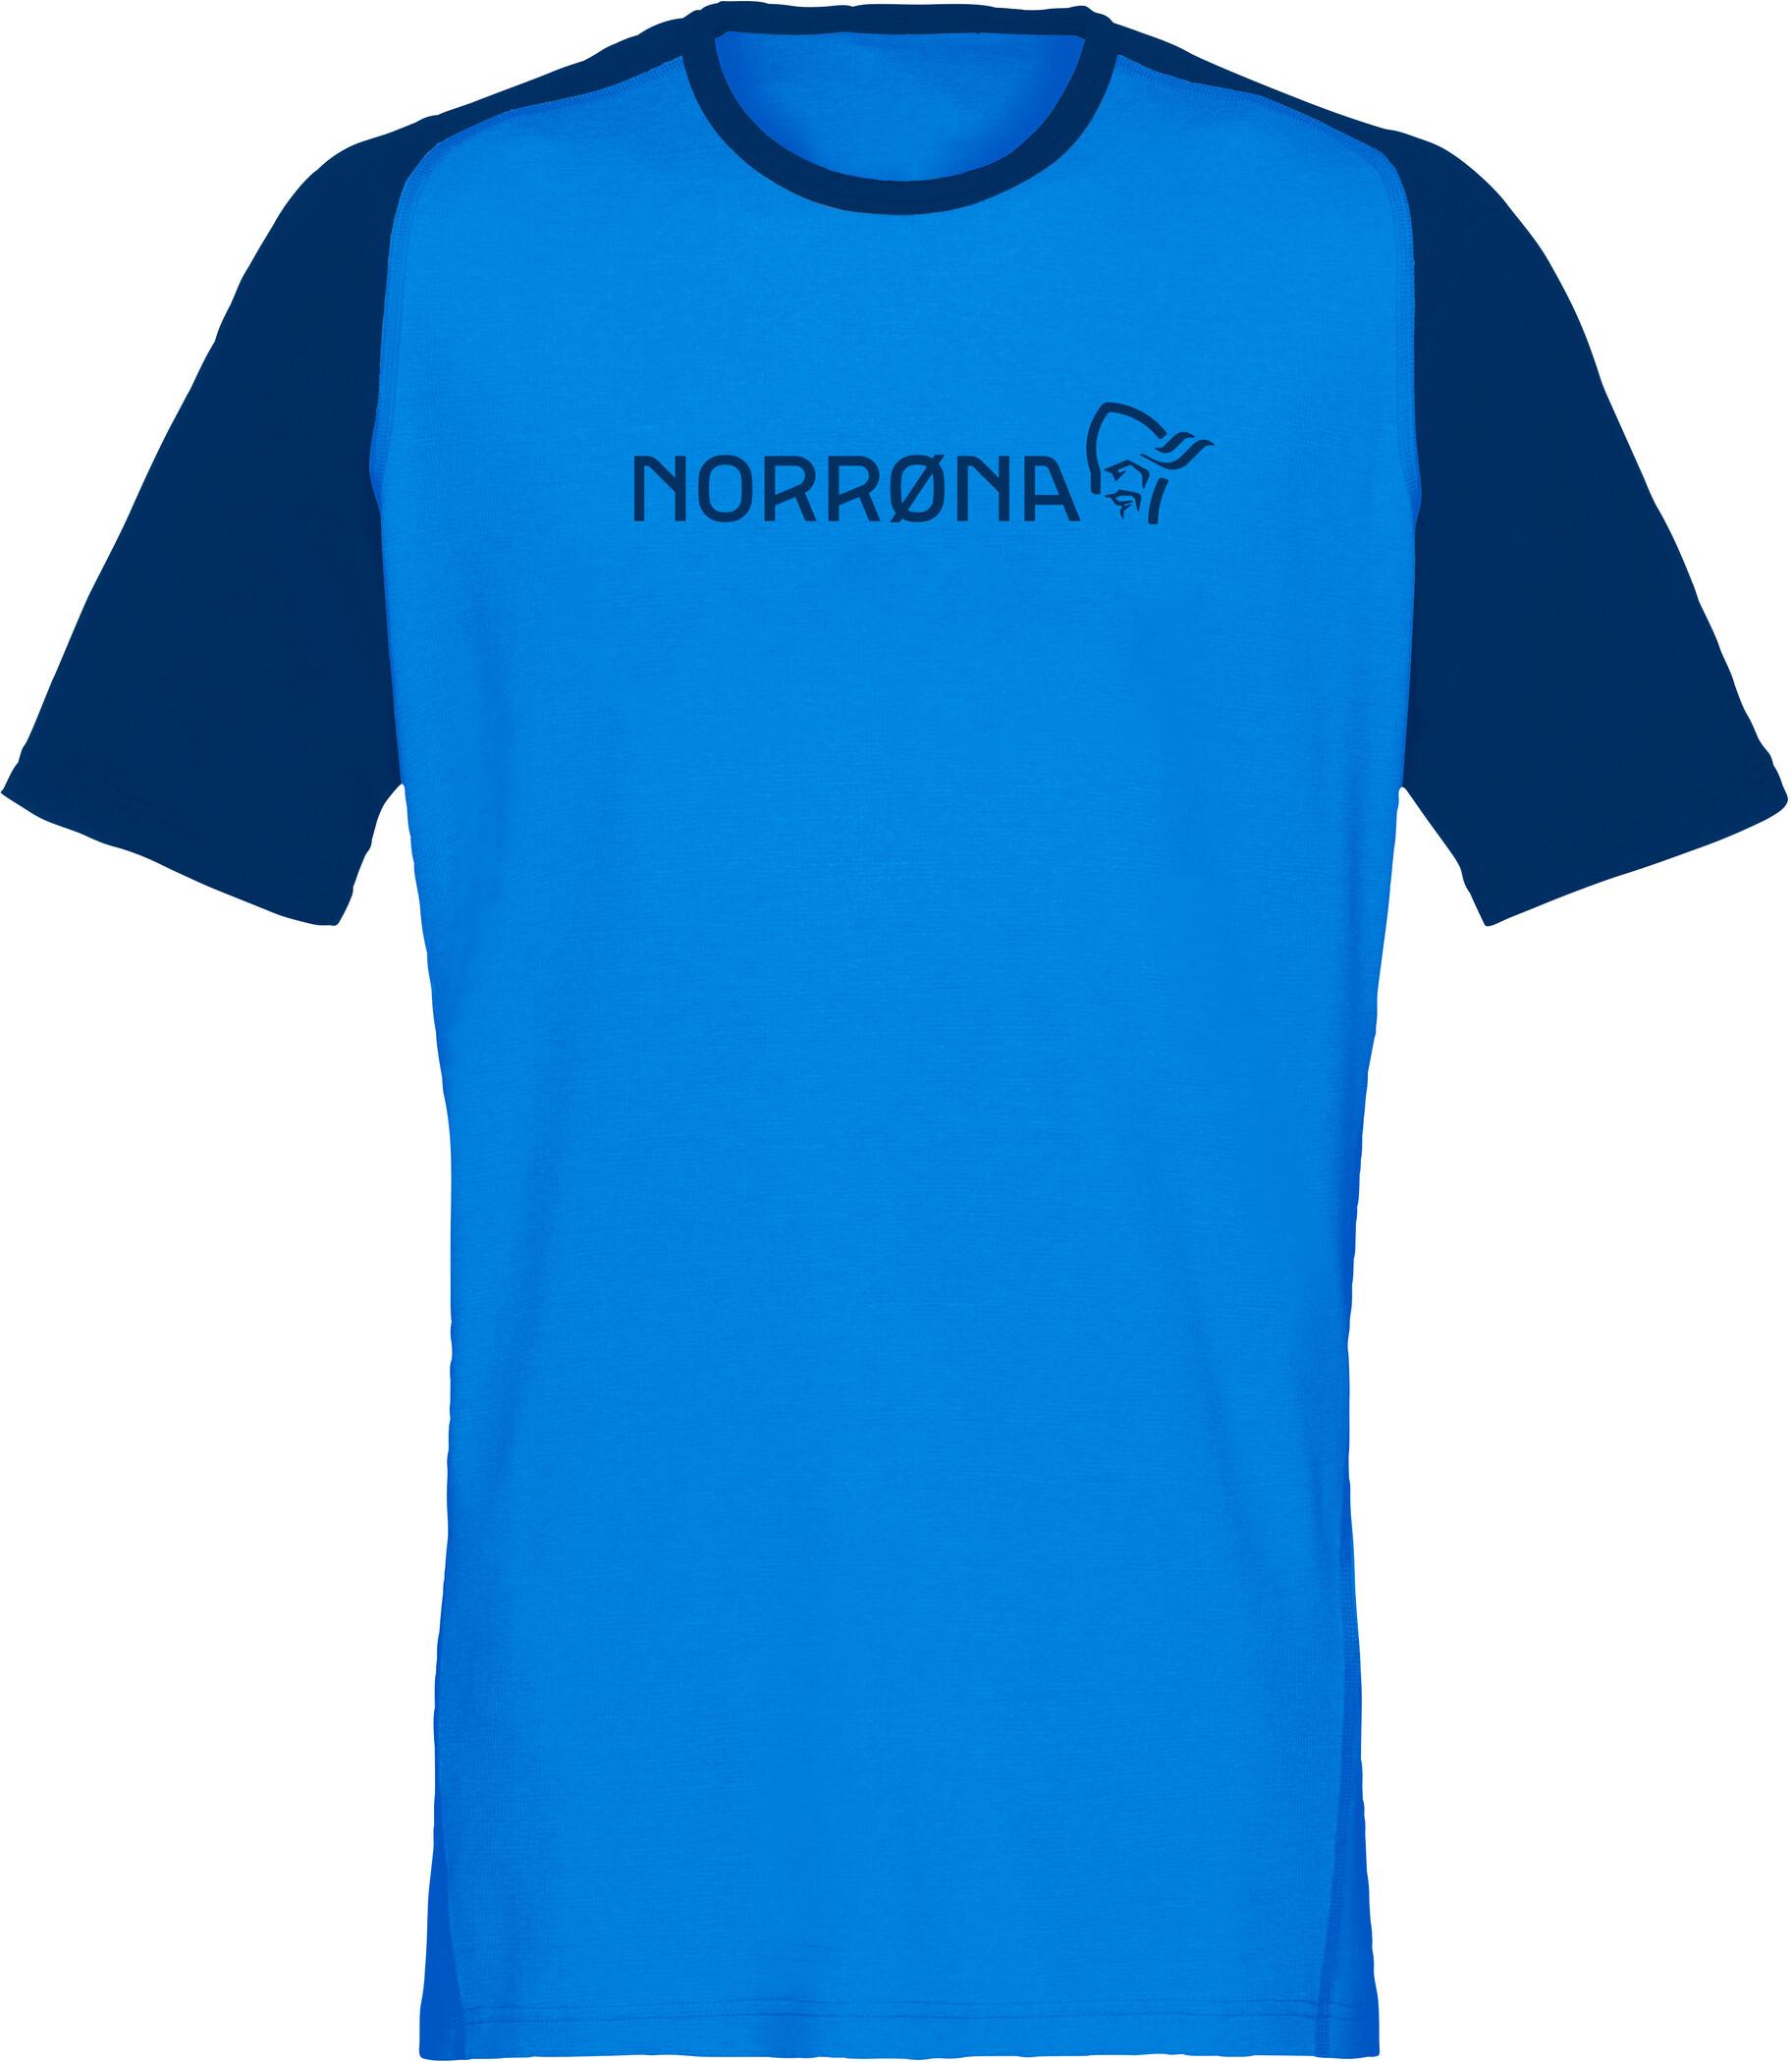 Norrøna Fjørå Equaliser Lightweight T-shirt Herrer, hot sapphire (2019)   Jerseys